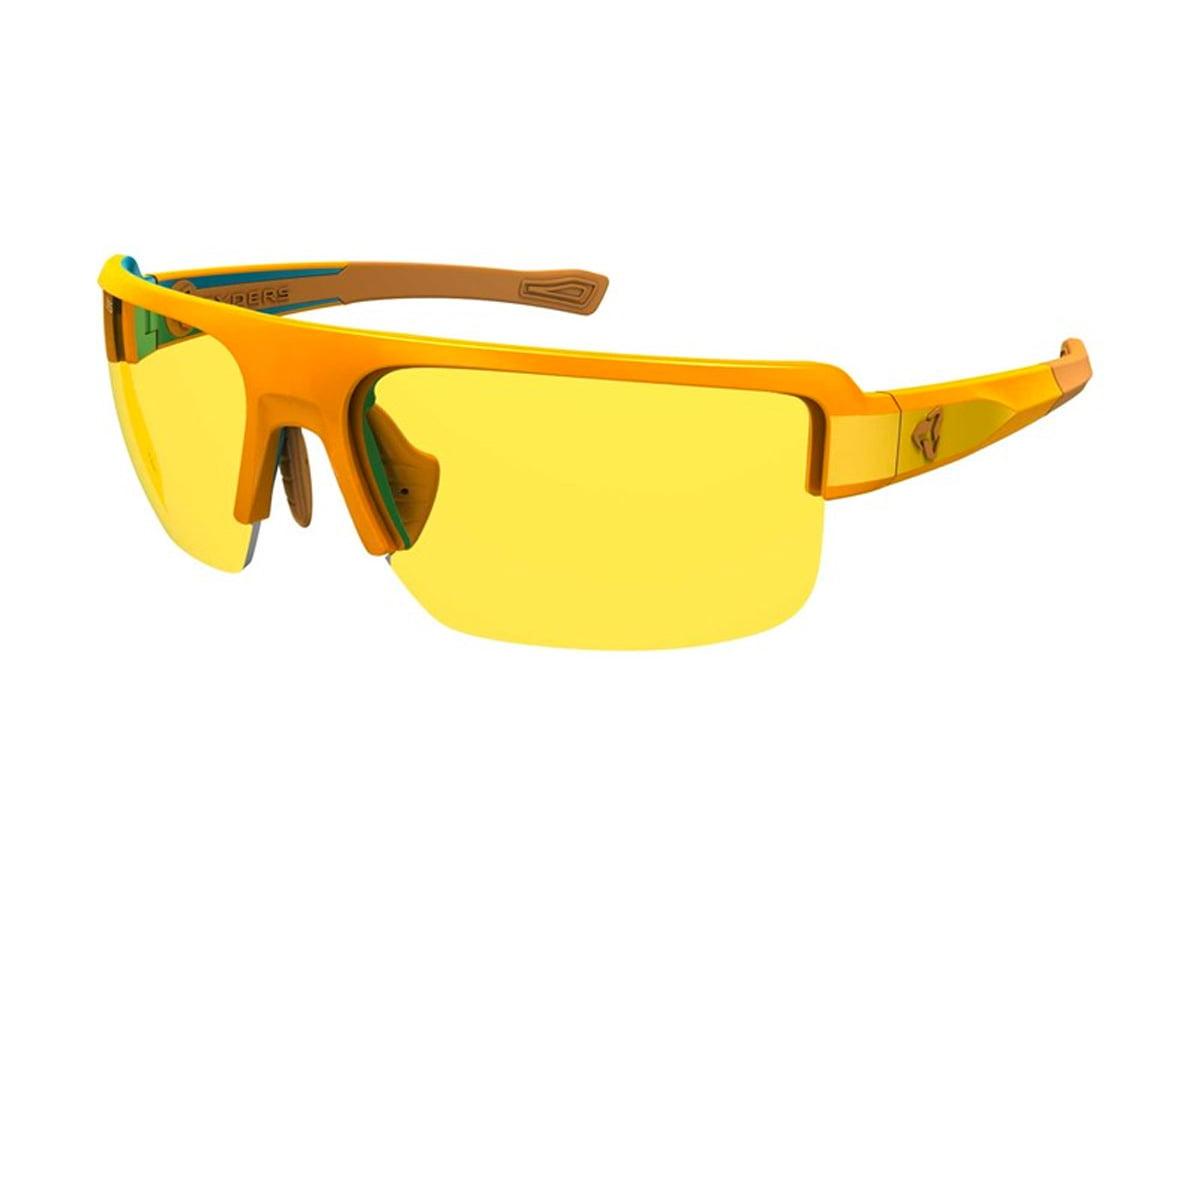 676ff2592a1 Ryders Eyewear - Seventh Standard Sunglasses - 2-Tone - Walmart.com